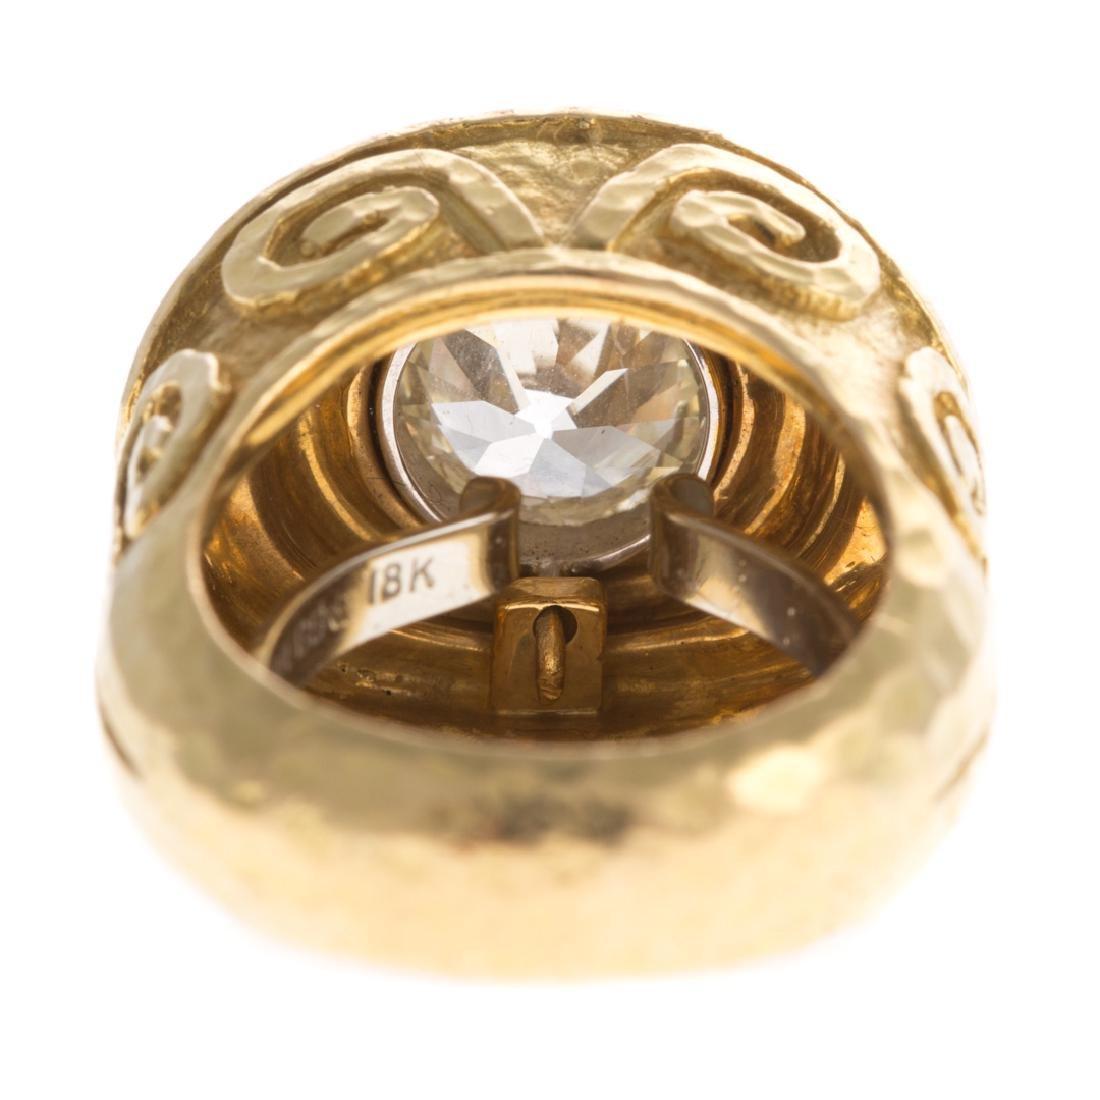 A 18K Diamond Ring & Enamel by David Webb - 8